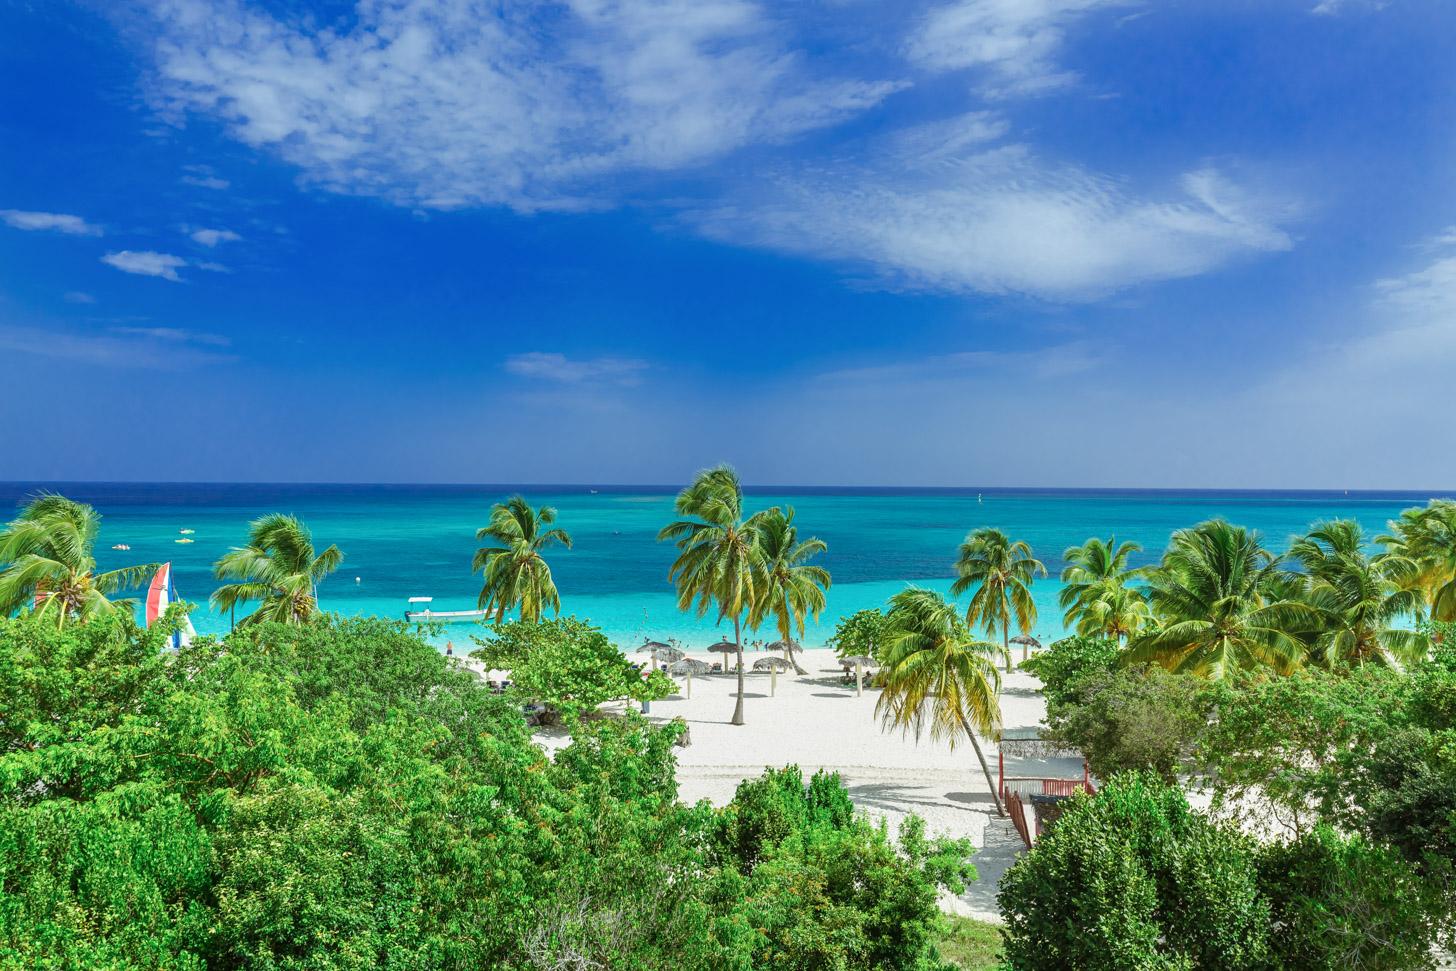 Strandvakantie in Cuba